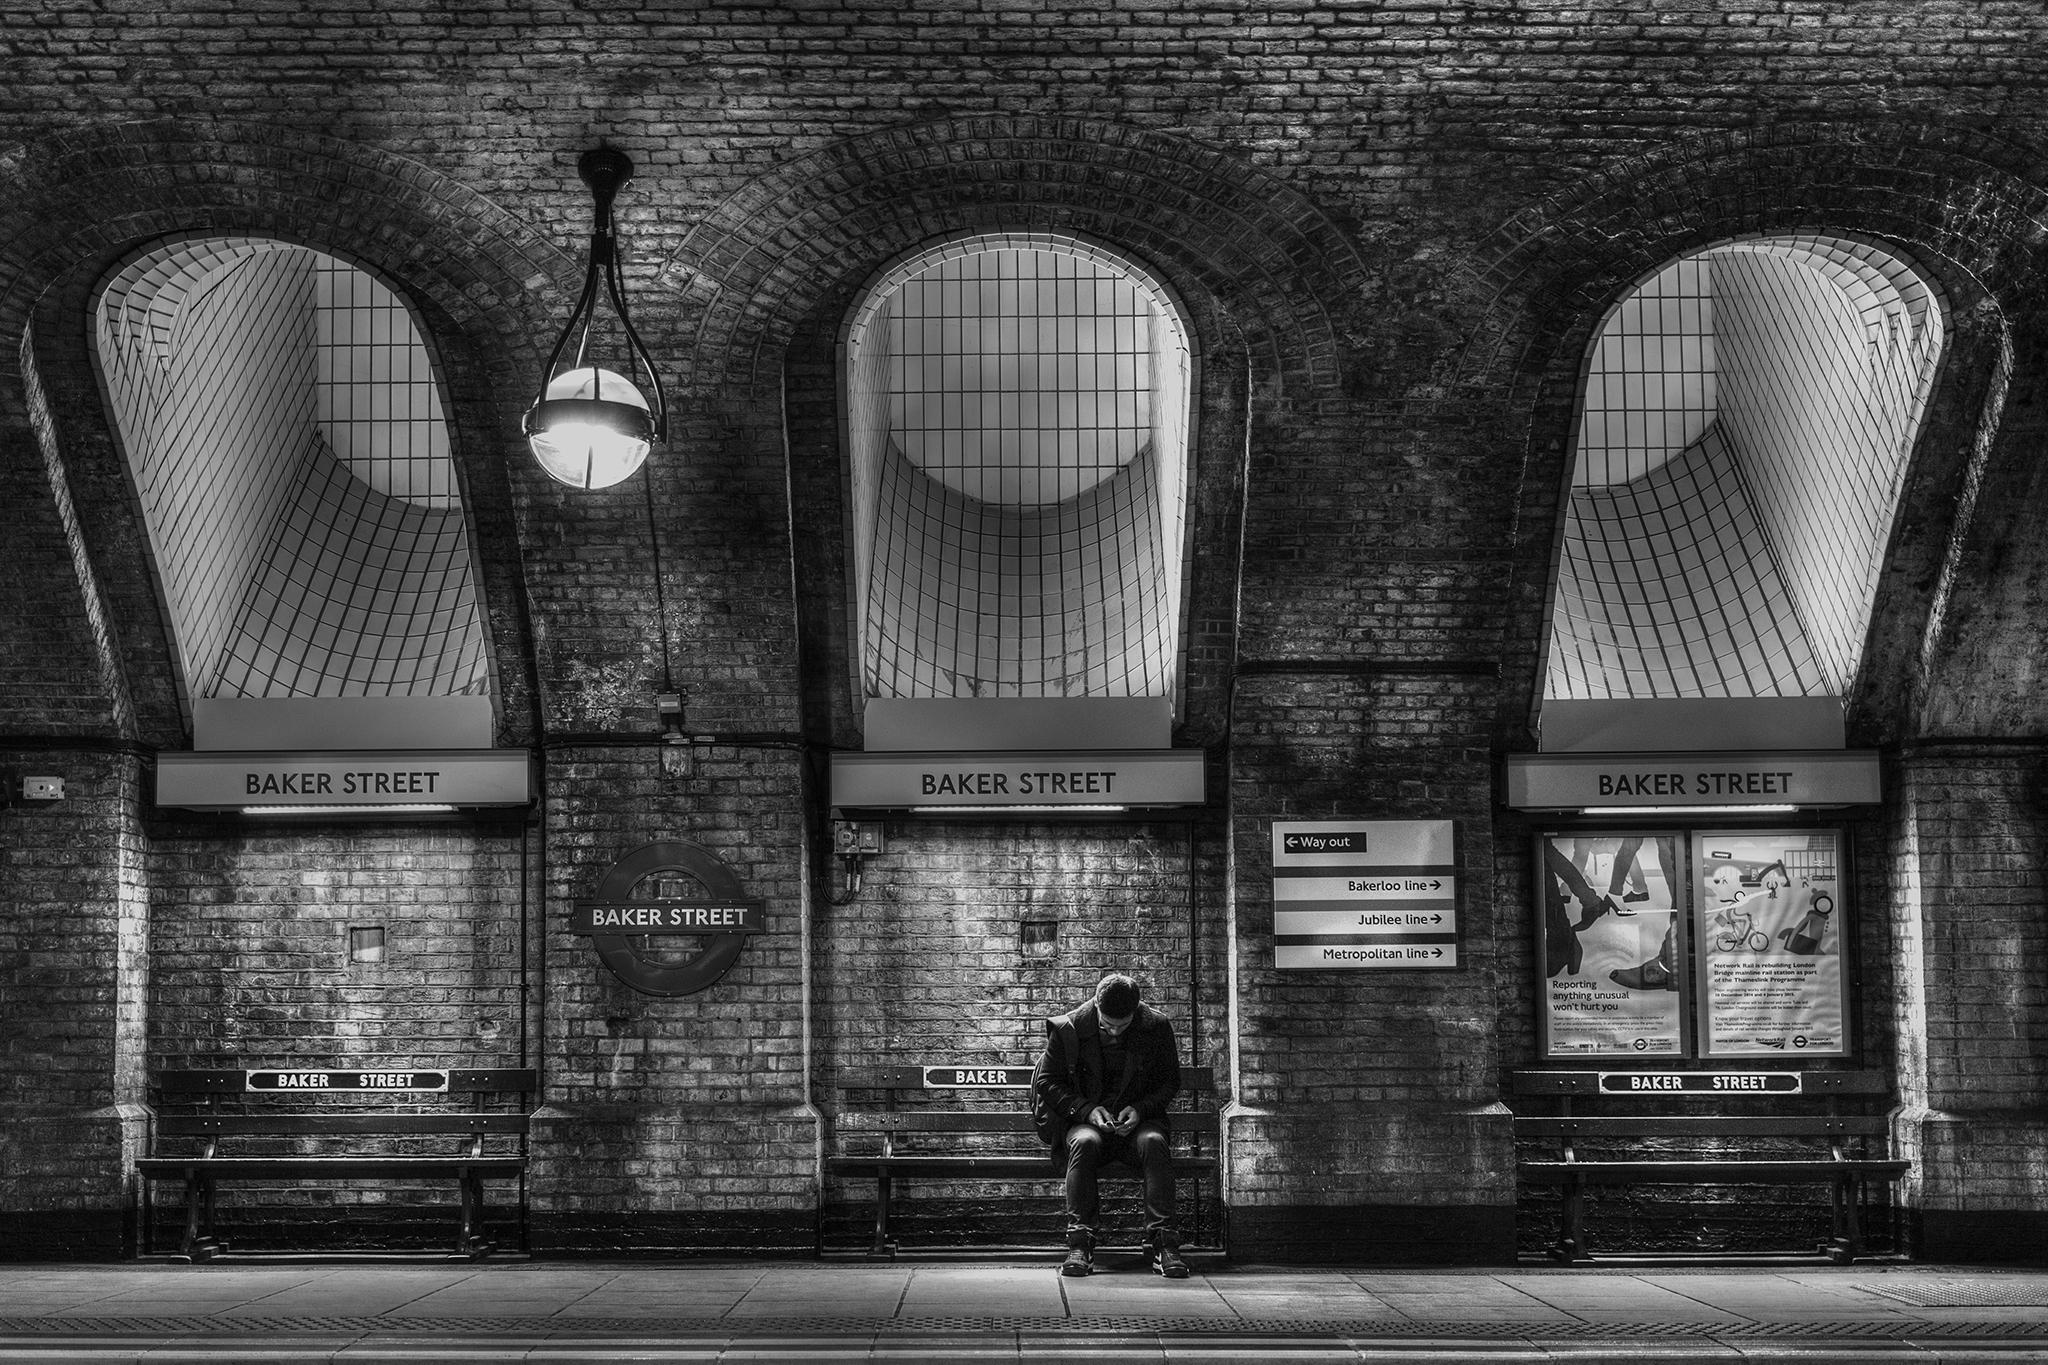 Baker Street Tube Station, United Kingdom